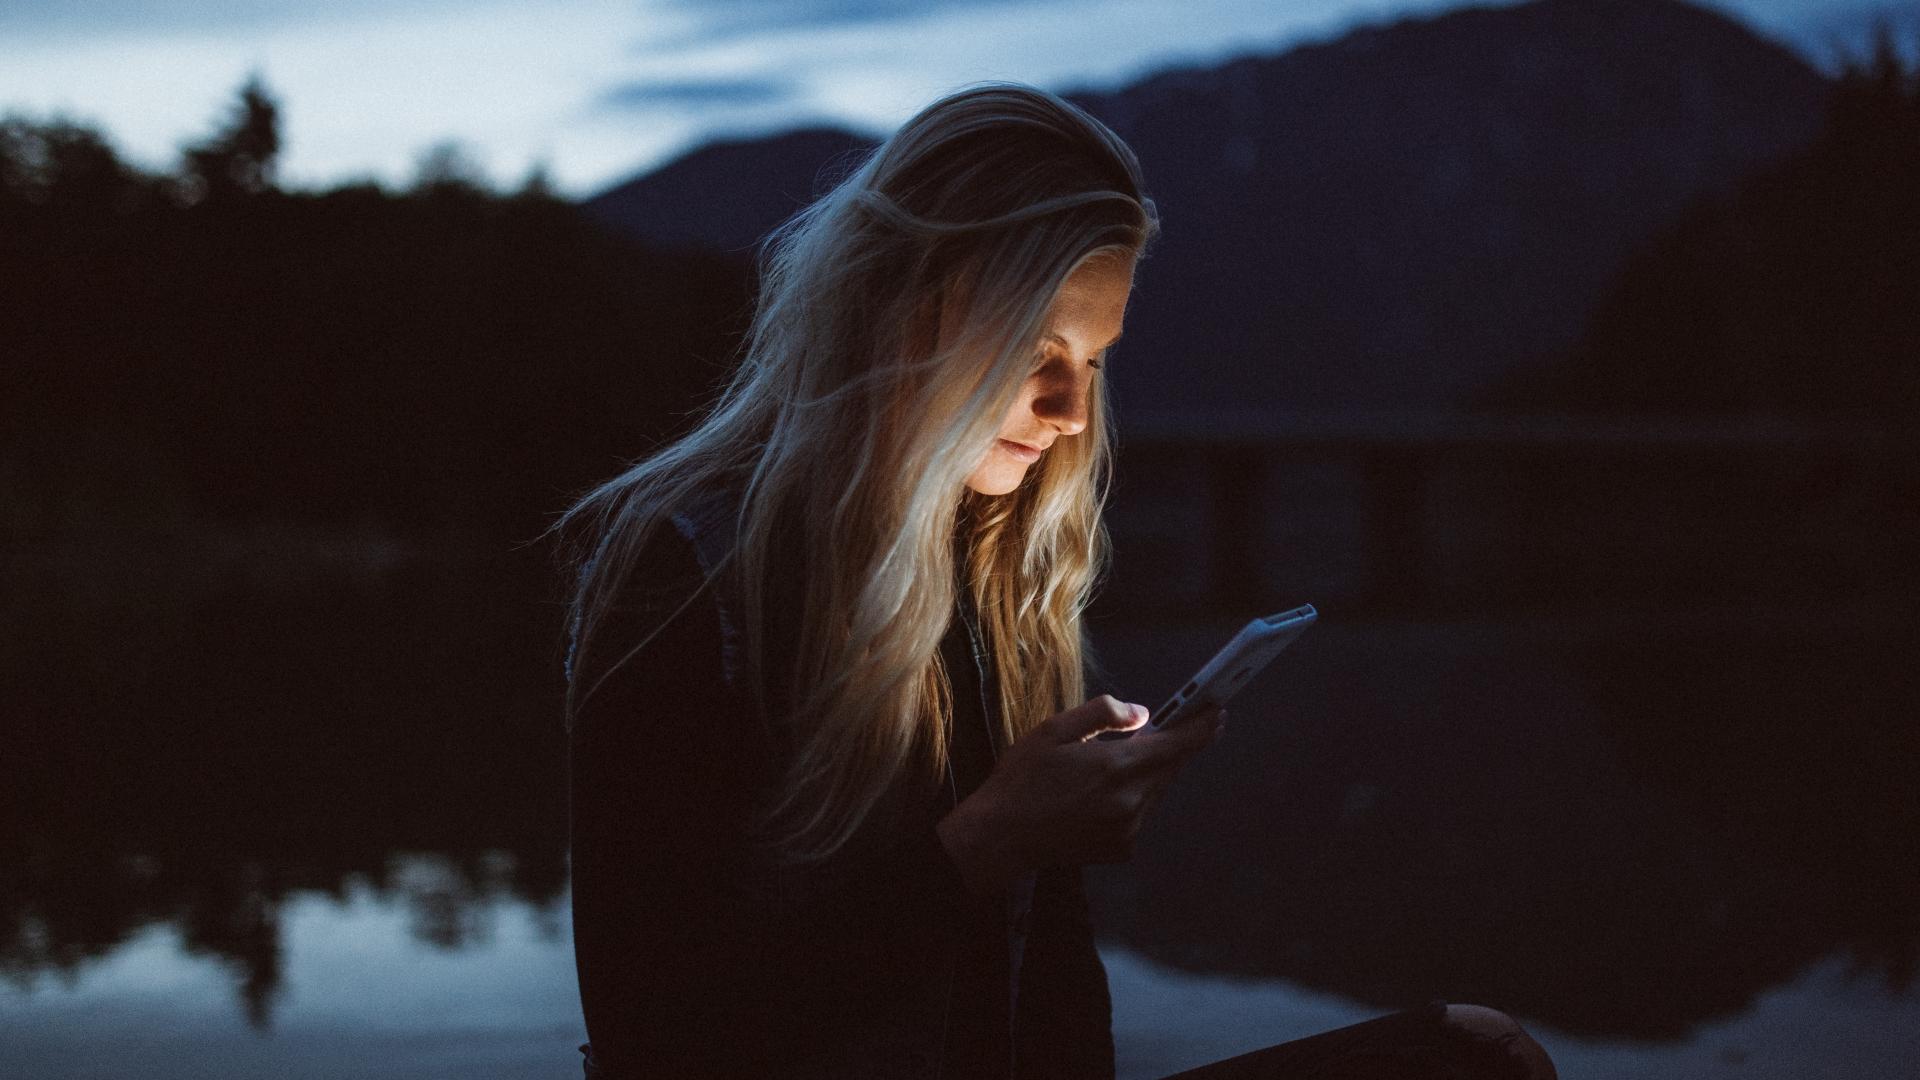 Handy, Mediensucht, Smartphone, unsplash.com, Becca Tapert